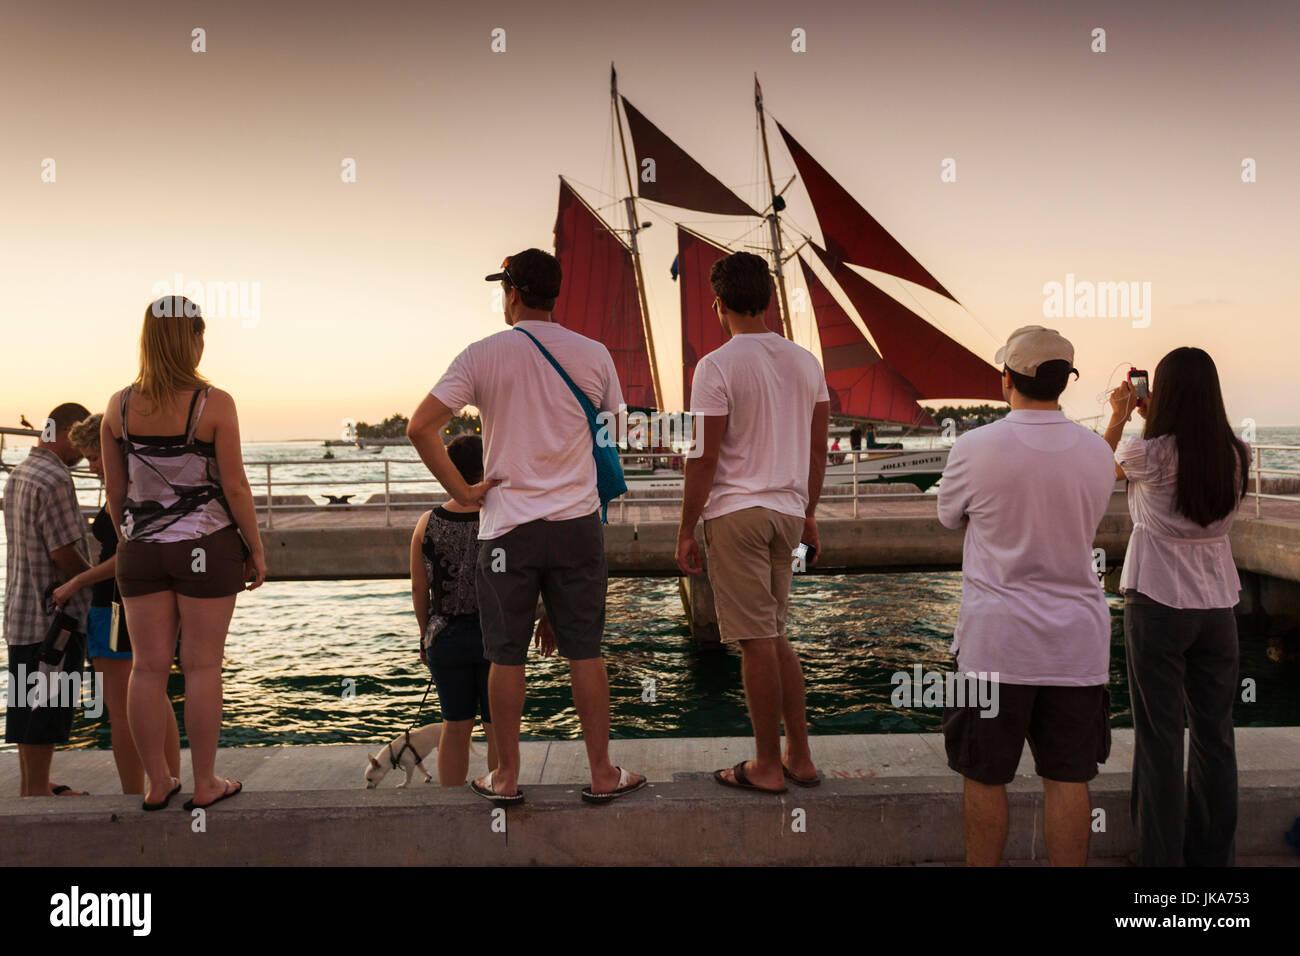 USA, Florida, Florida Keys, Key West, Mallory Square, daily sunset party, - Stock Image